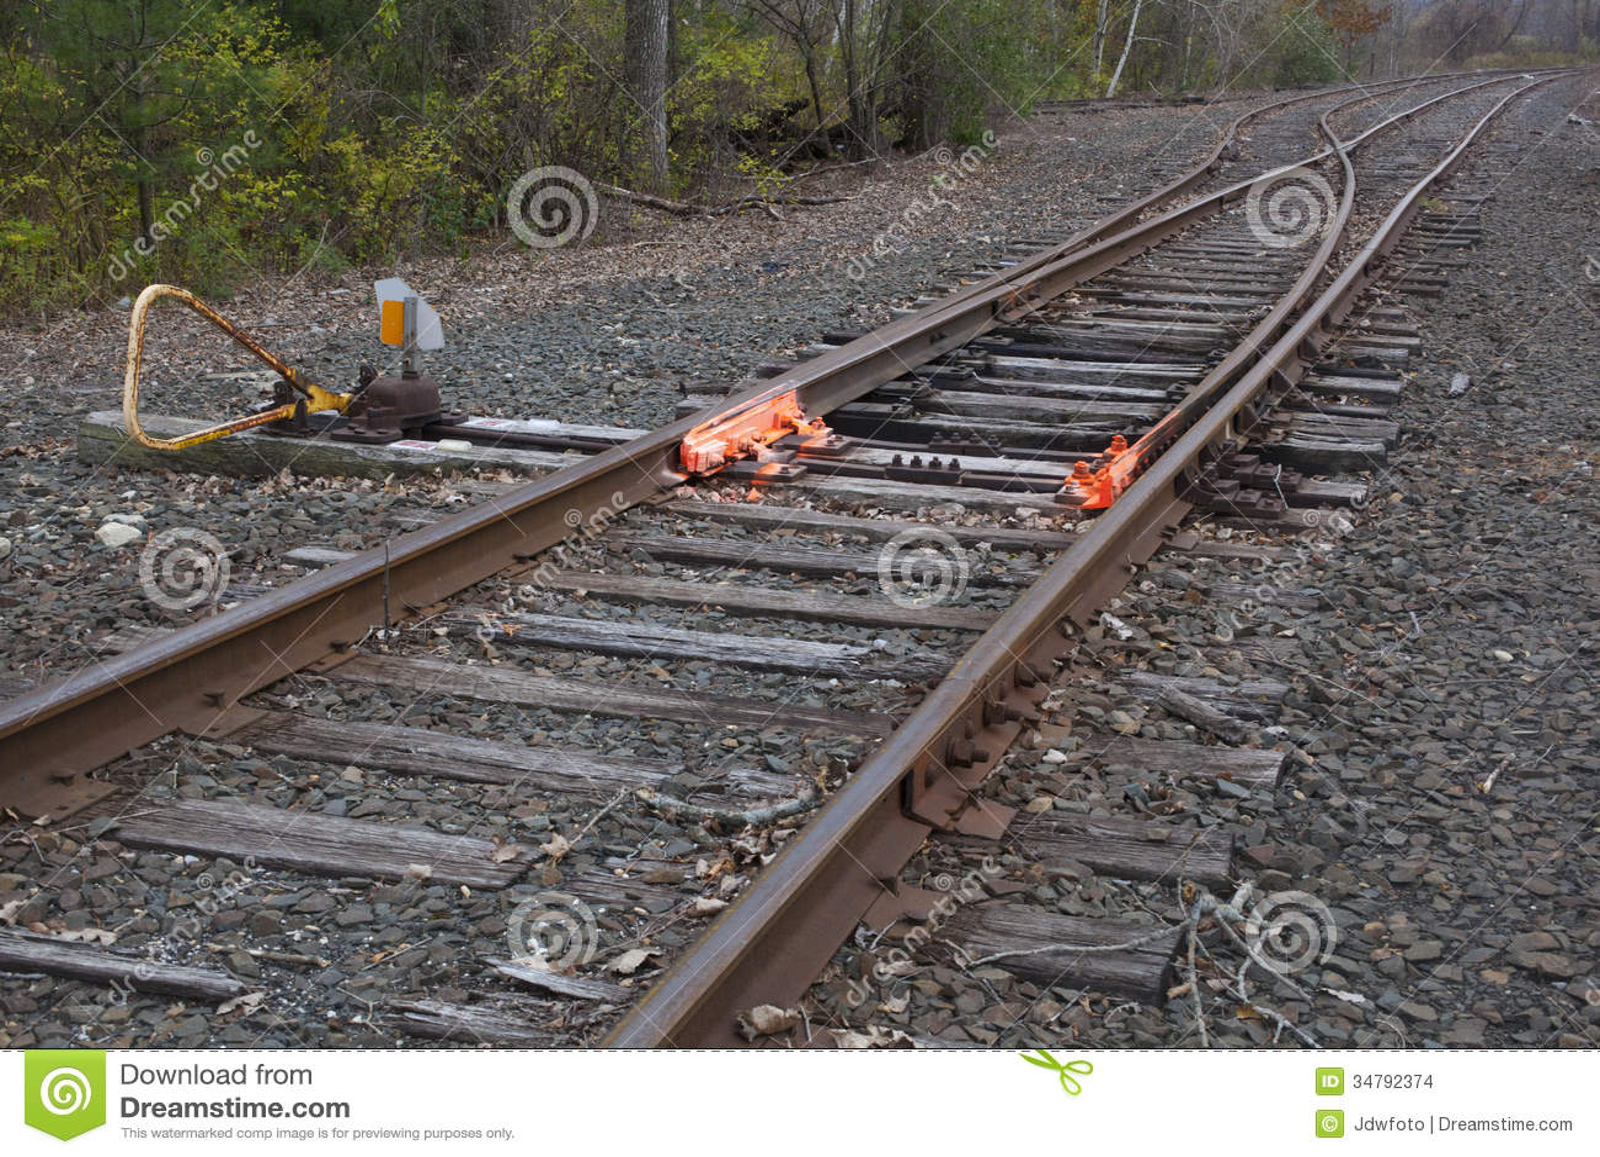 Levers Train Tracks O N : Railroad track switch stock photo image of train railway